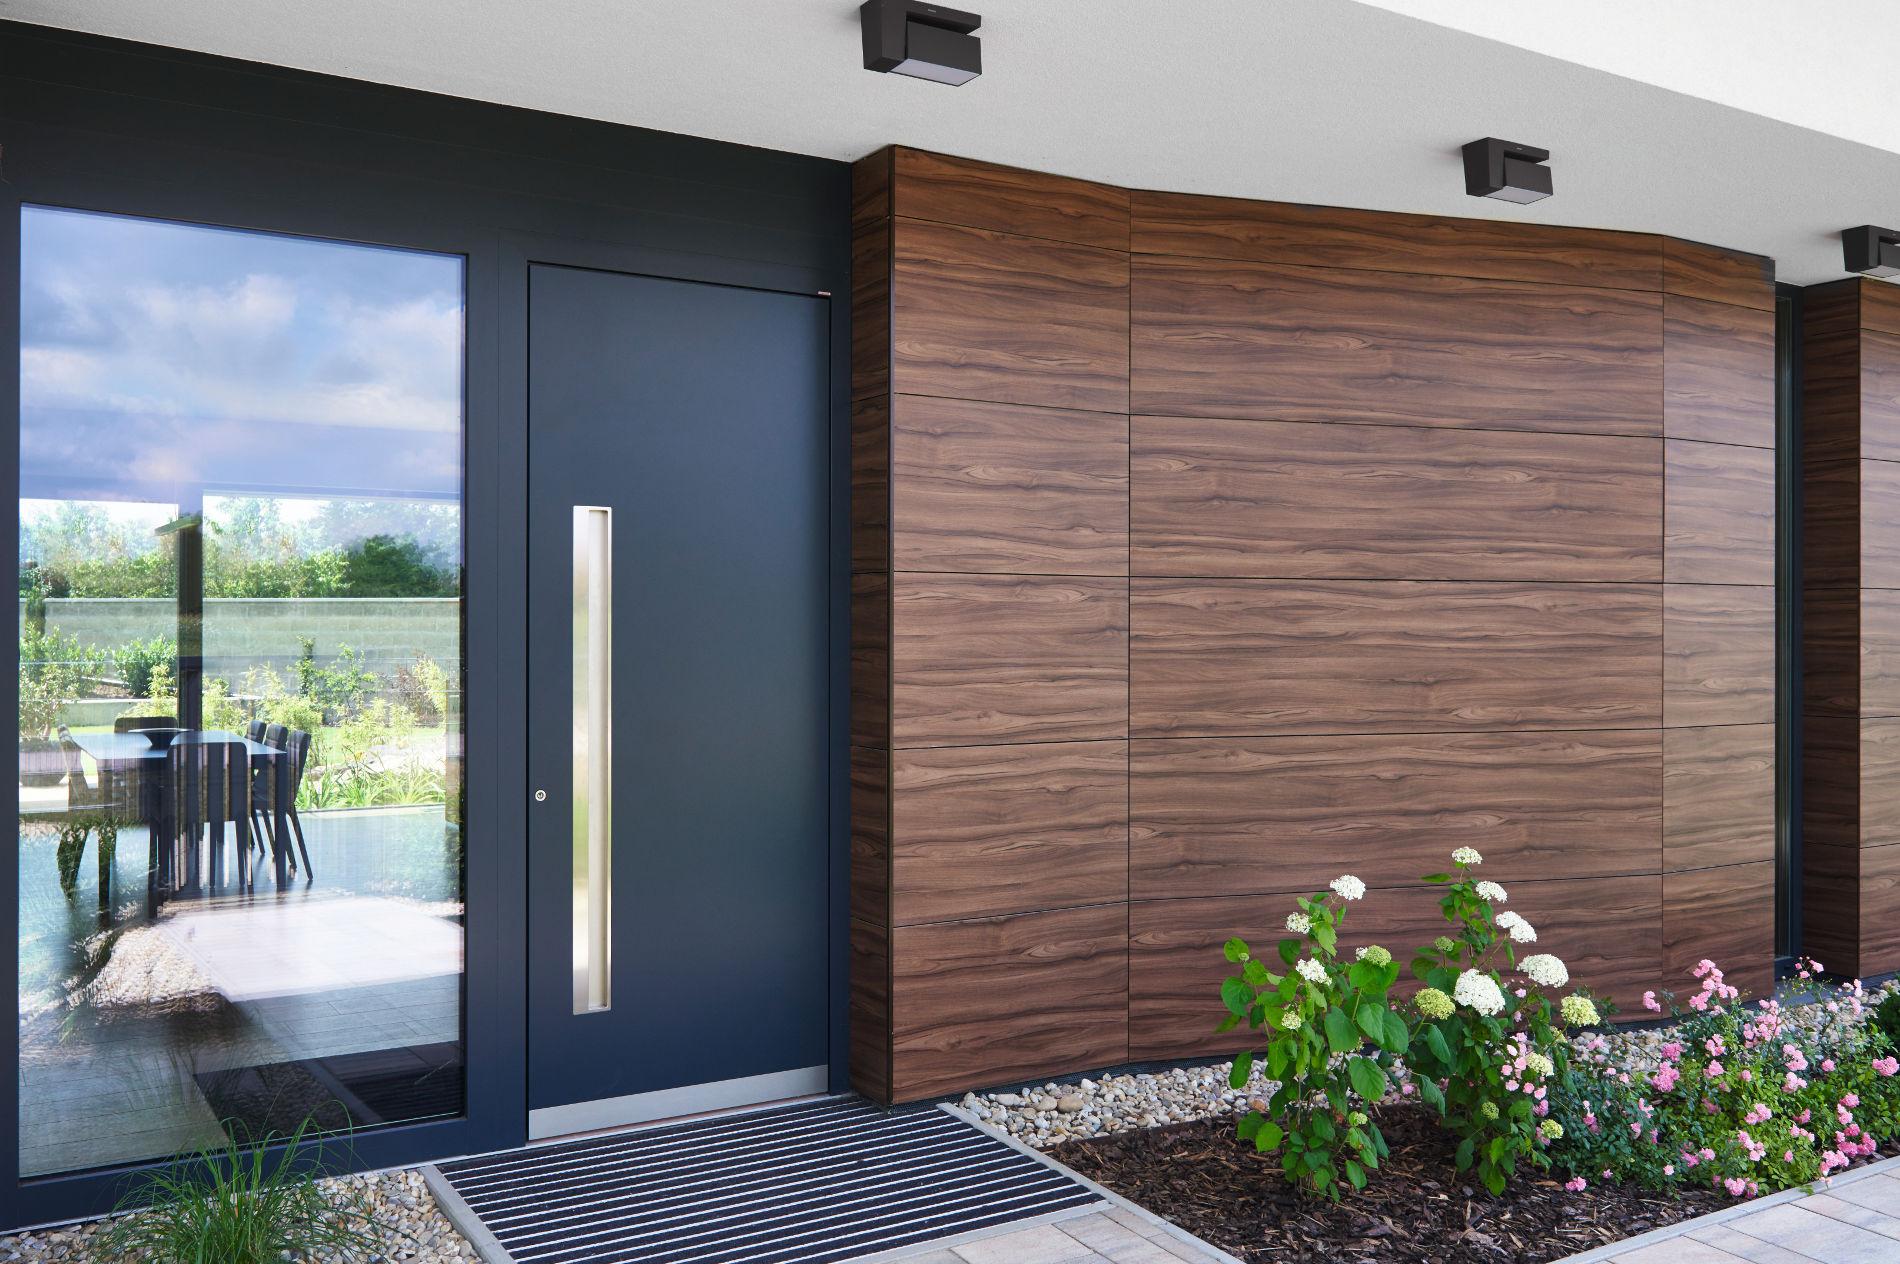 porta-blindata-ingresso-Internorm-alluminio-modello-AT410_1 [©INTERNORM] aria-label=